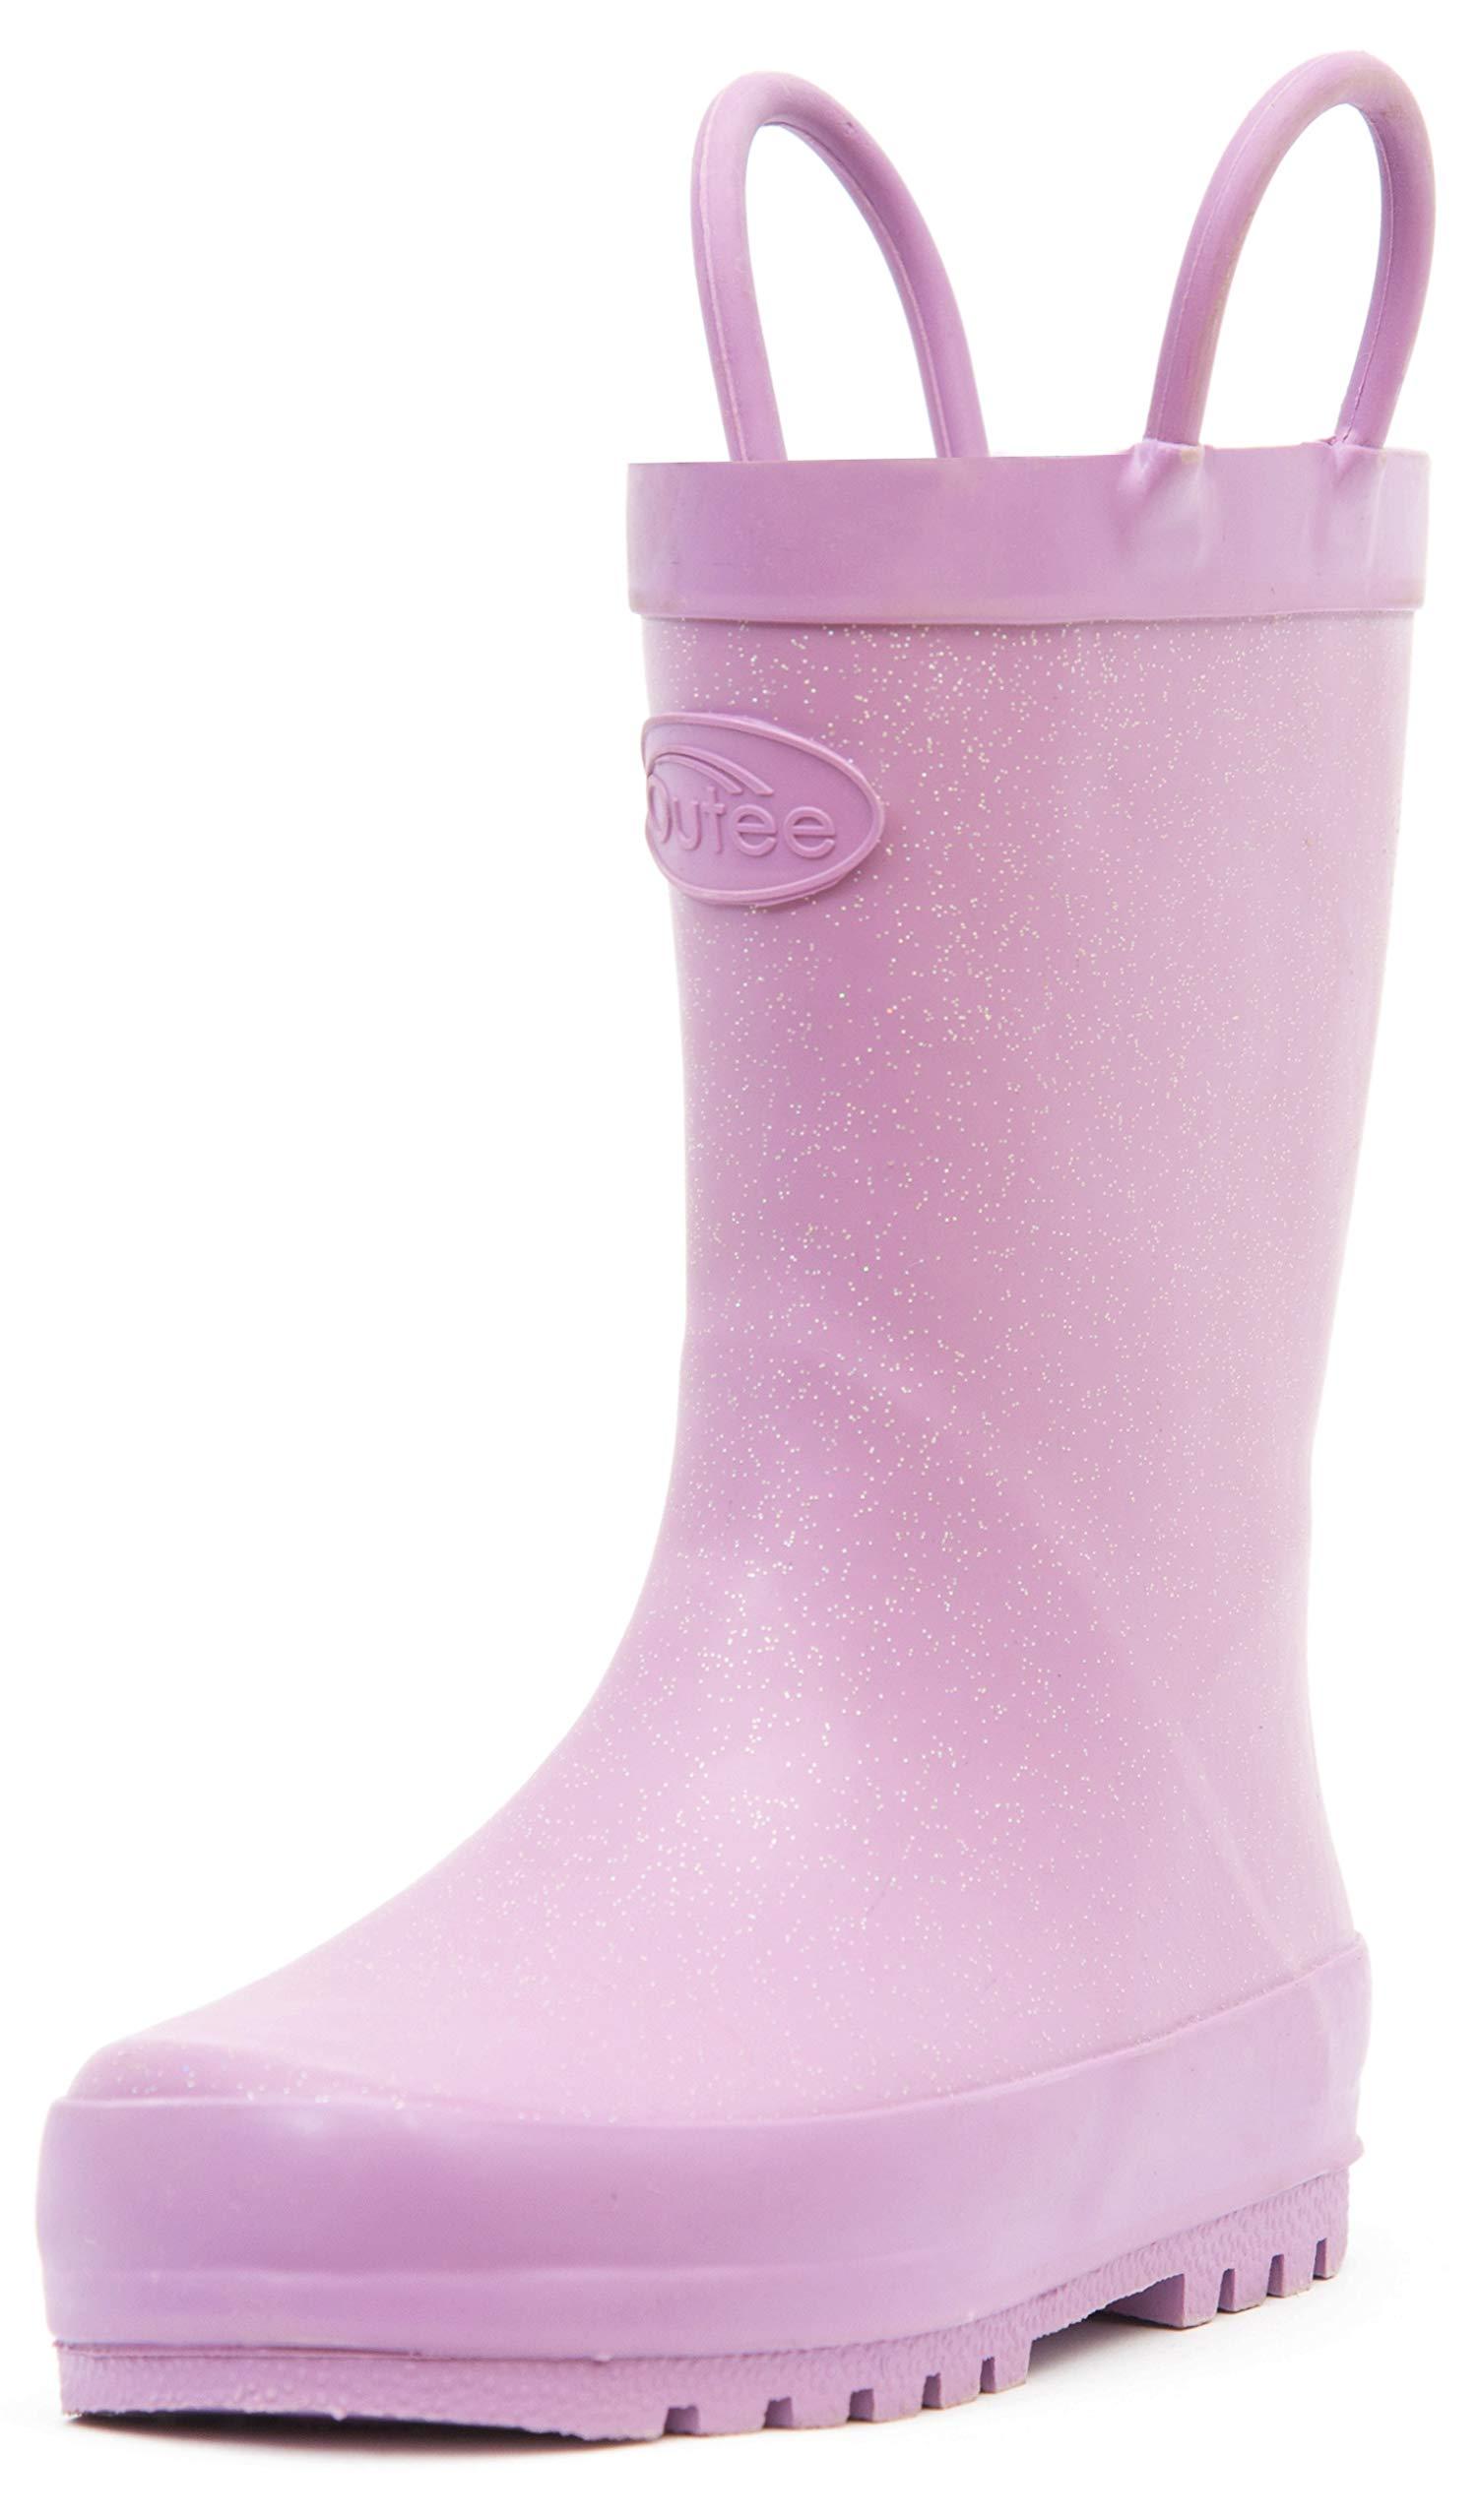 535f6c1bdf9 Best Rated in Girls' Rain Boots & Helpful Customer Reviews - Amazon.com